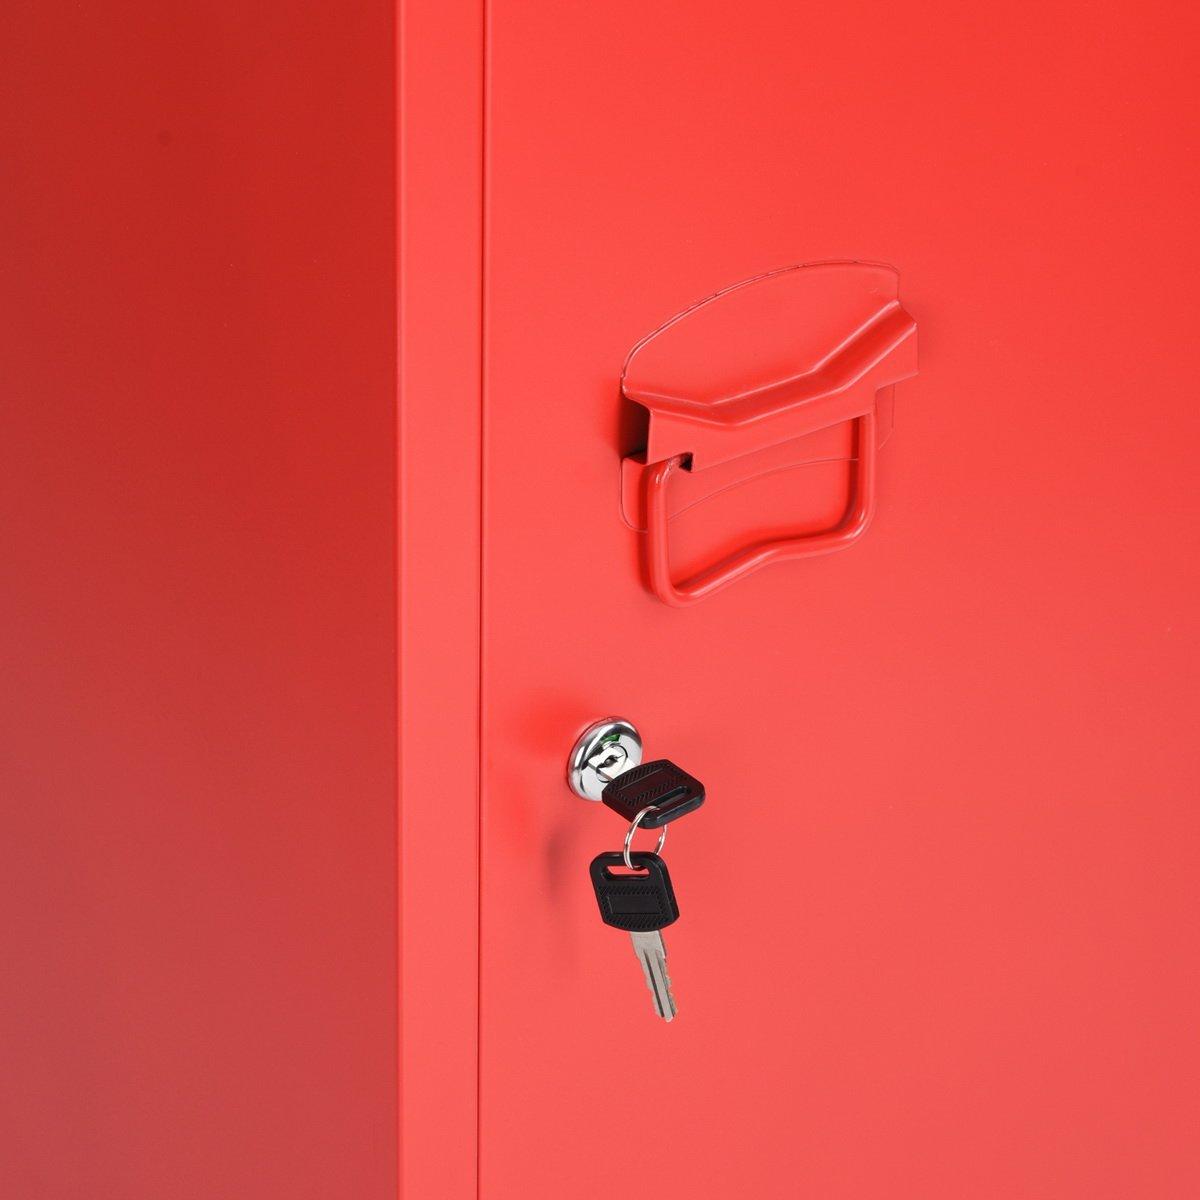 HouseinBox Office File Storage Metal Cabinet 3 Door Cupboard Locker Organizer Console Stand 3-in-1 (RED-Standing Locker) by HouseinBox (Image #7)